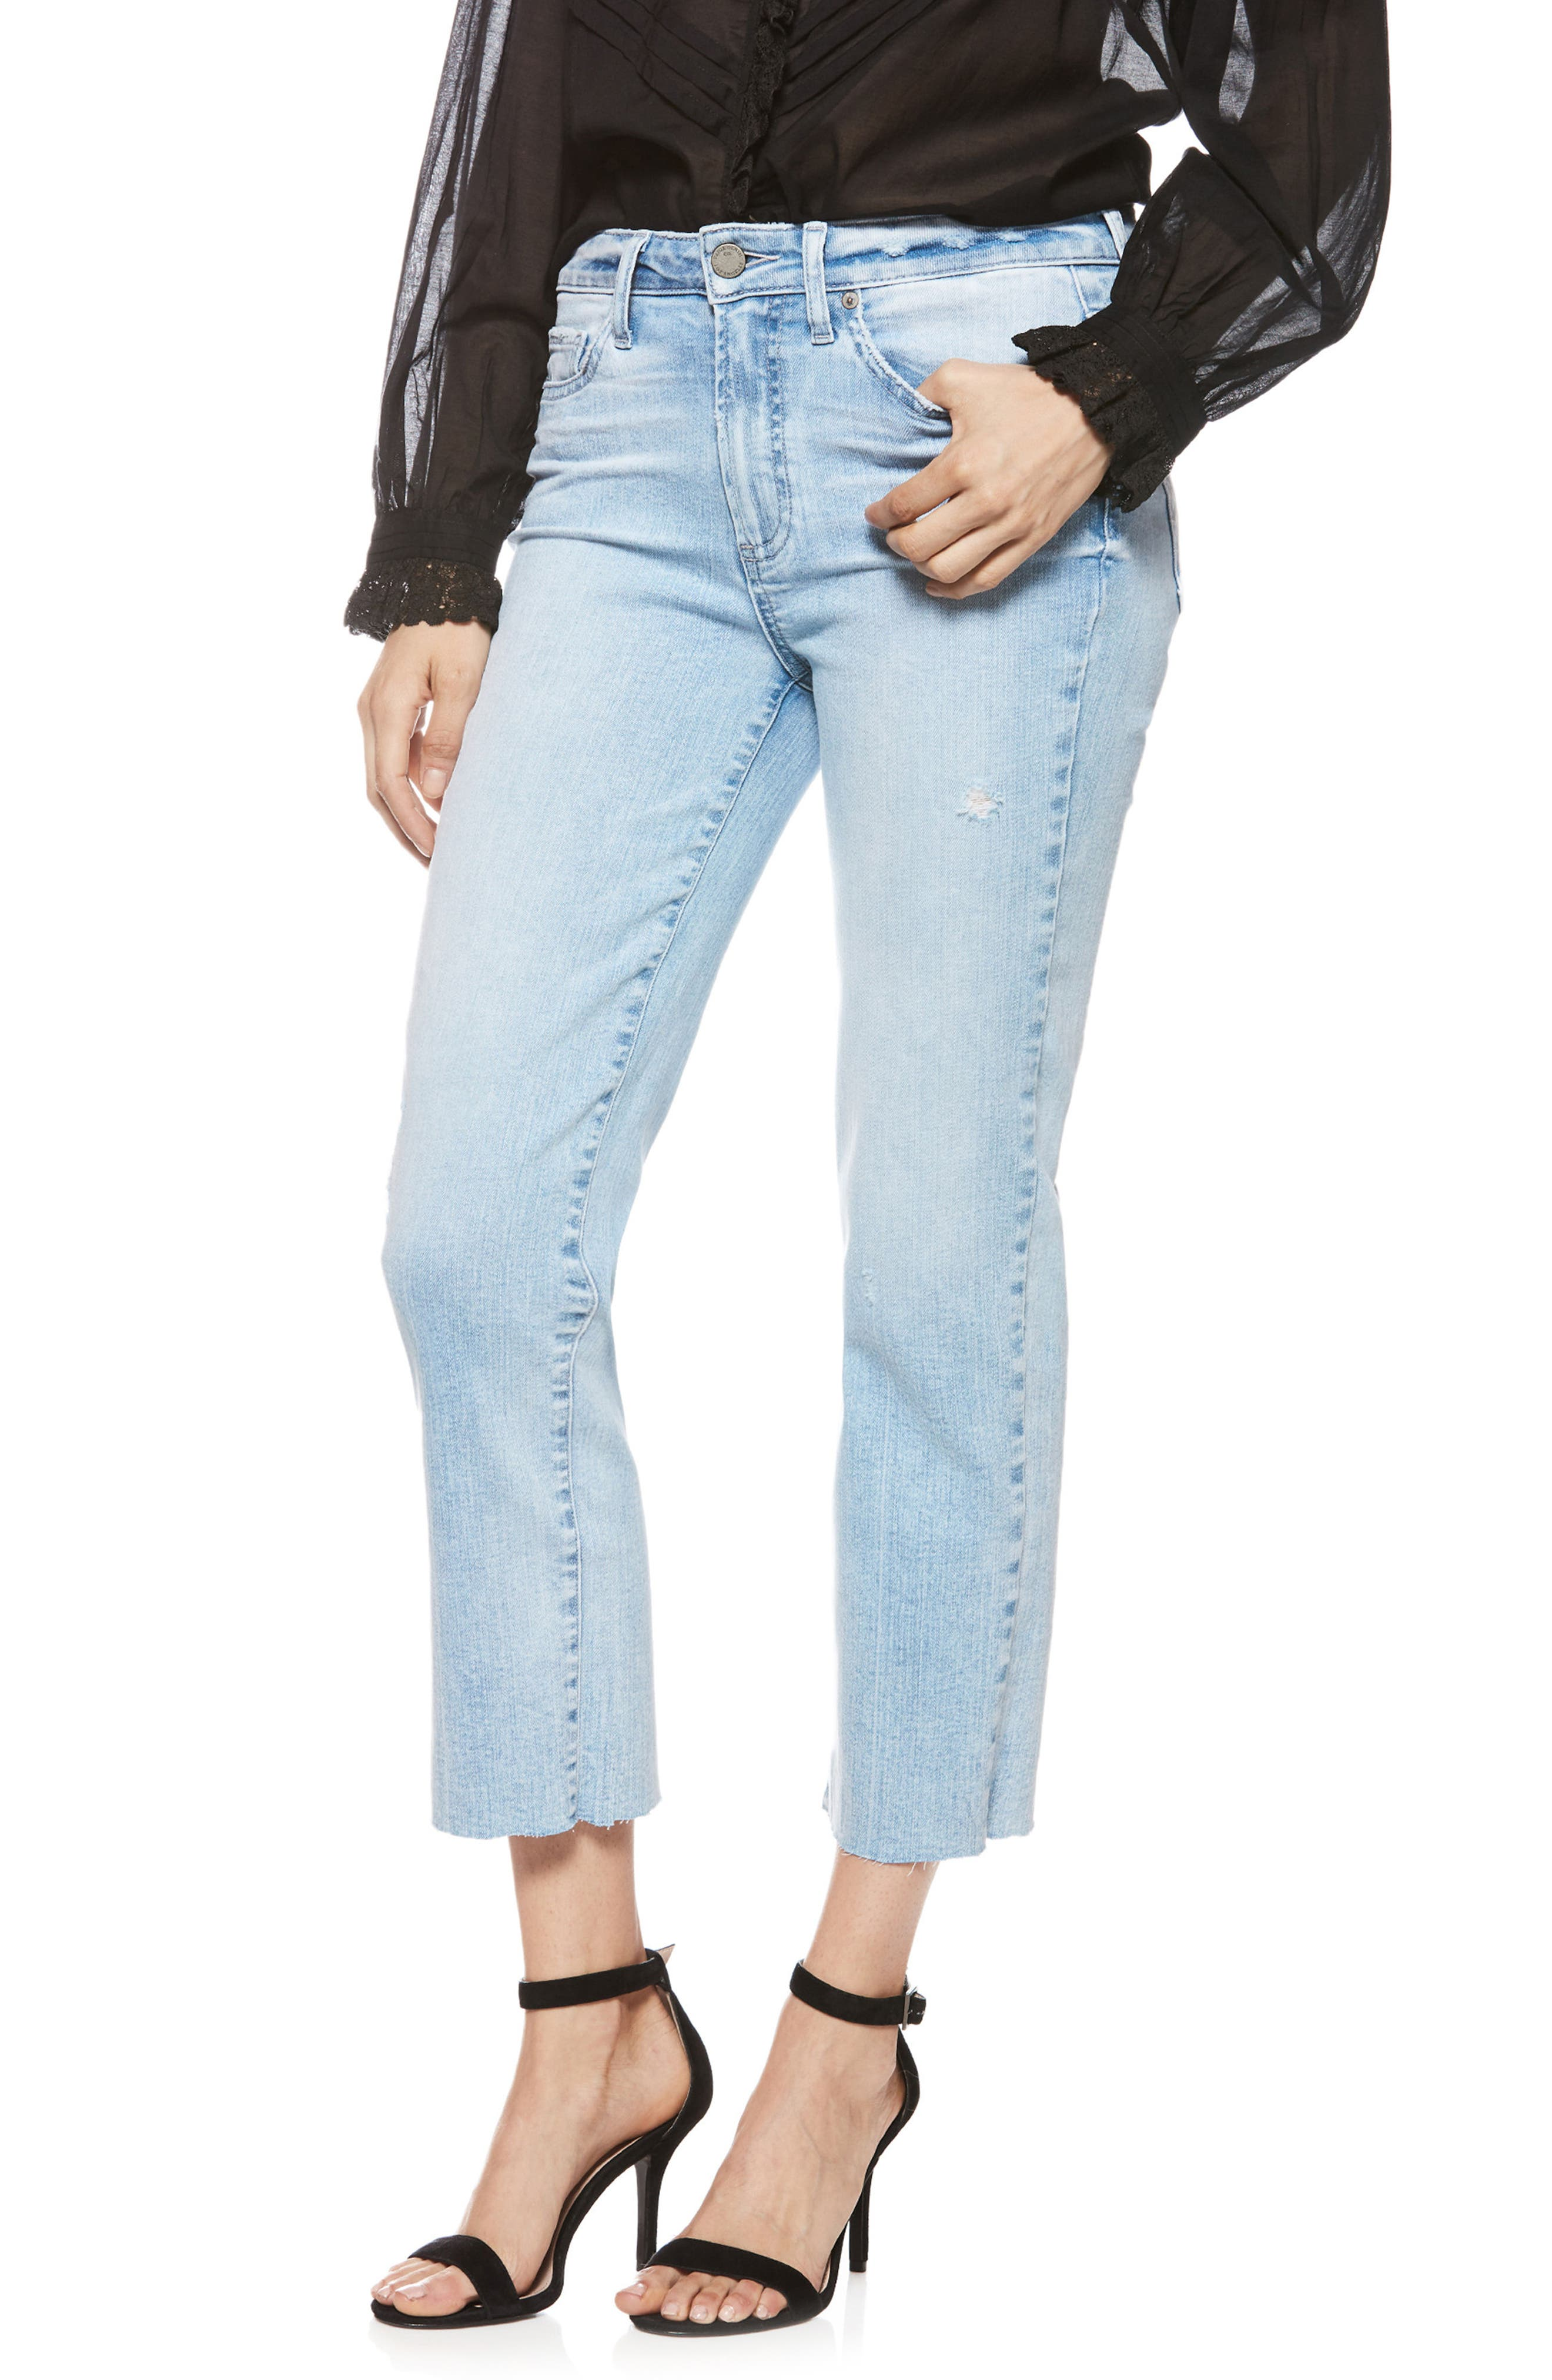 Hoxton High Waist Crop Straight Leg Jeans,                         Main,                         color, Pasadena W/ Wash Crease